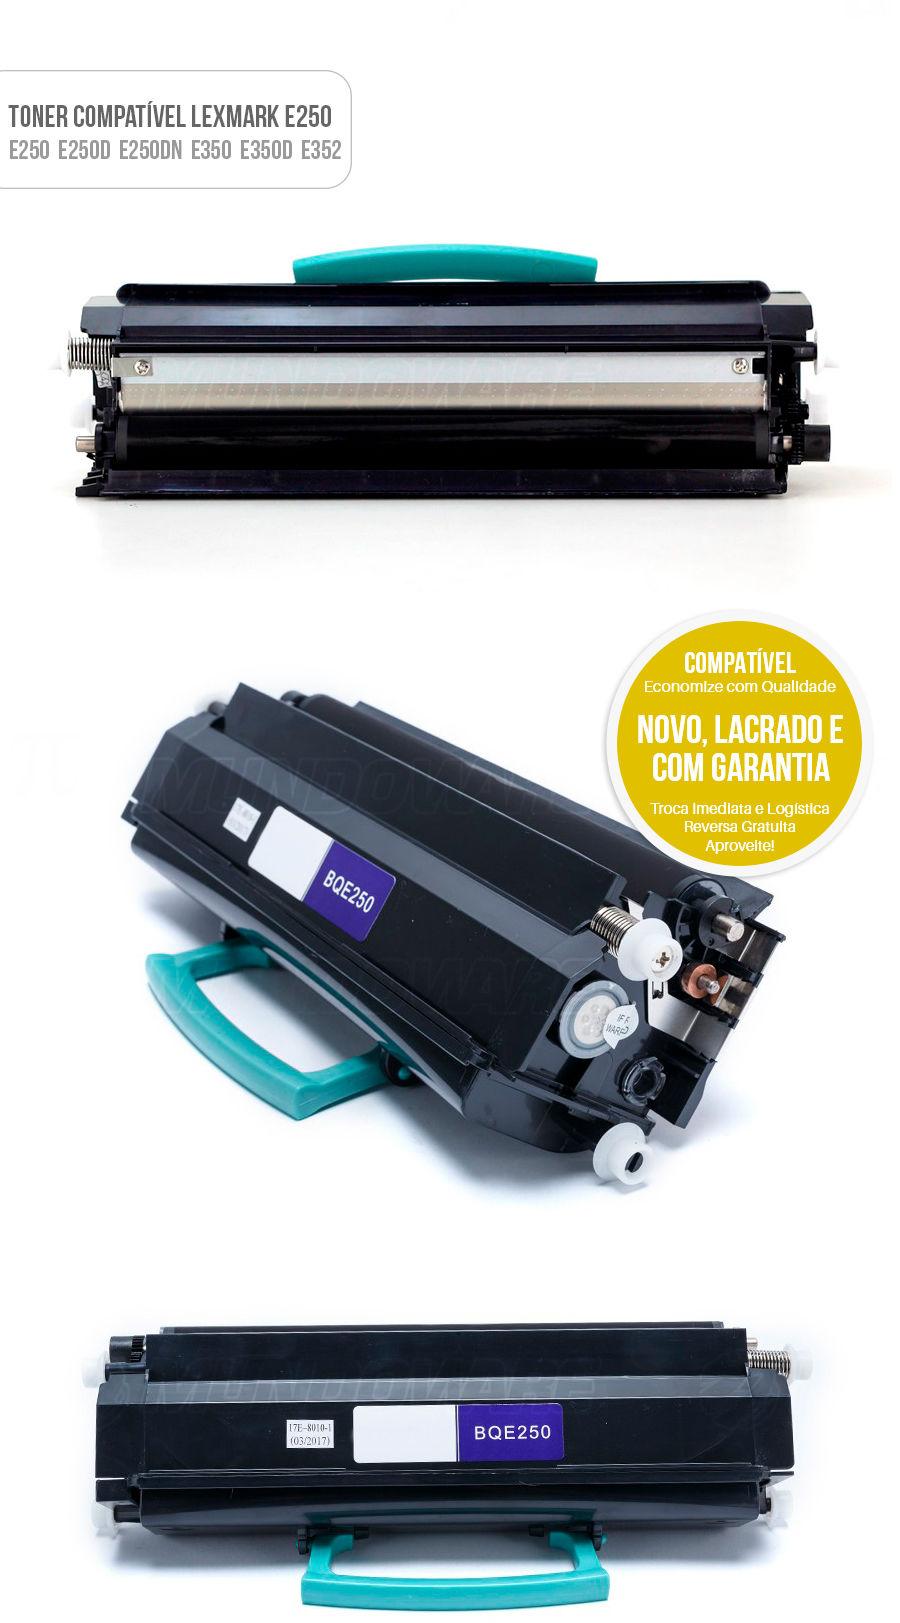 Toner Compatível com Lexmark E250 E350 E352 E450 E450N E450DN E250D E250DN E250 Tonner